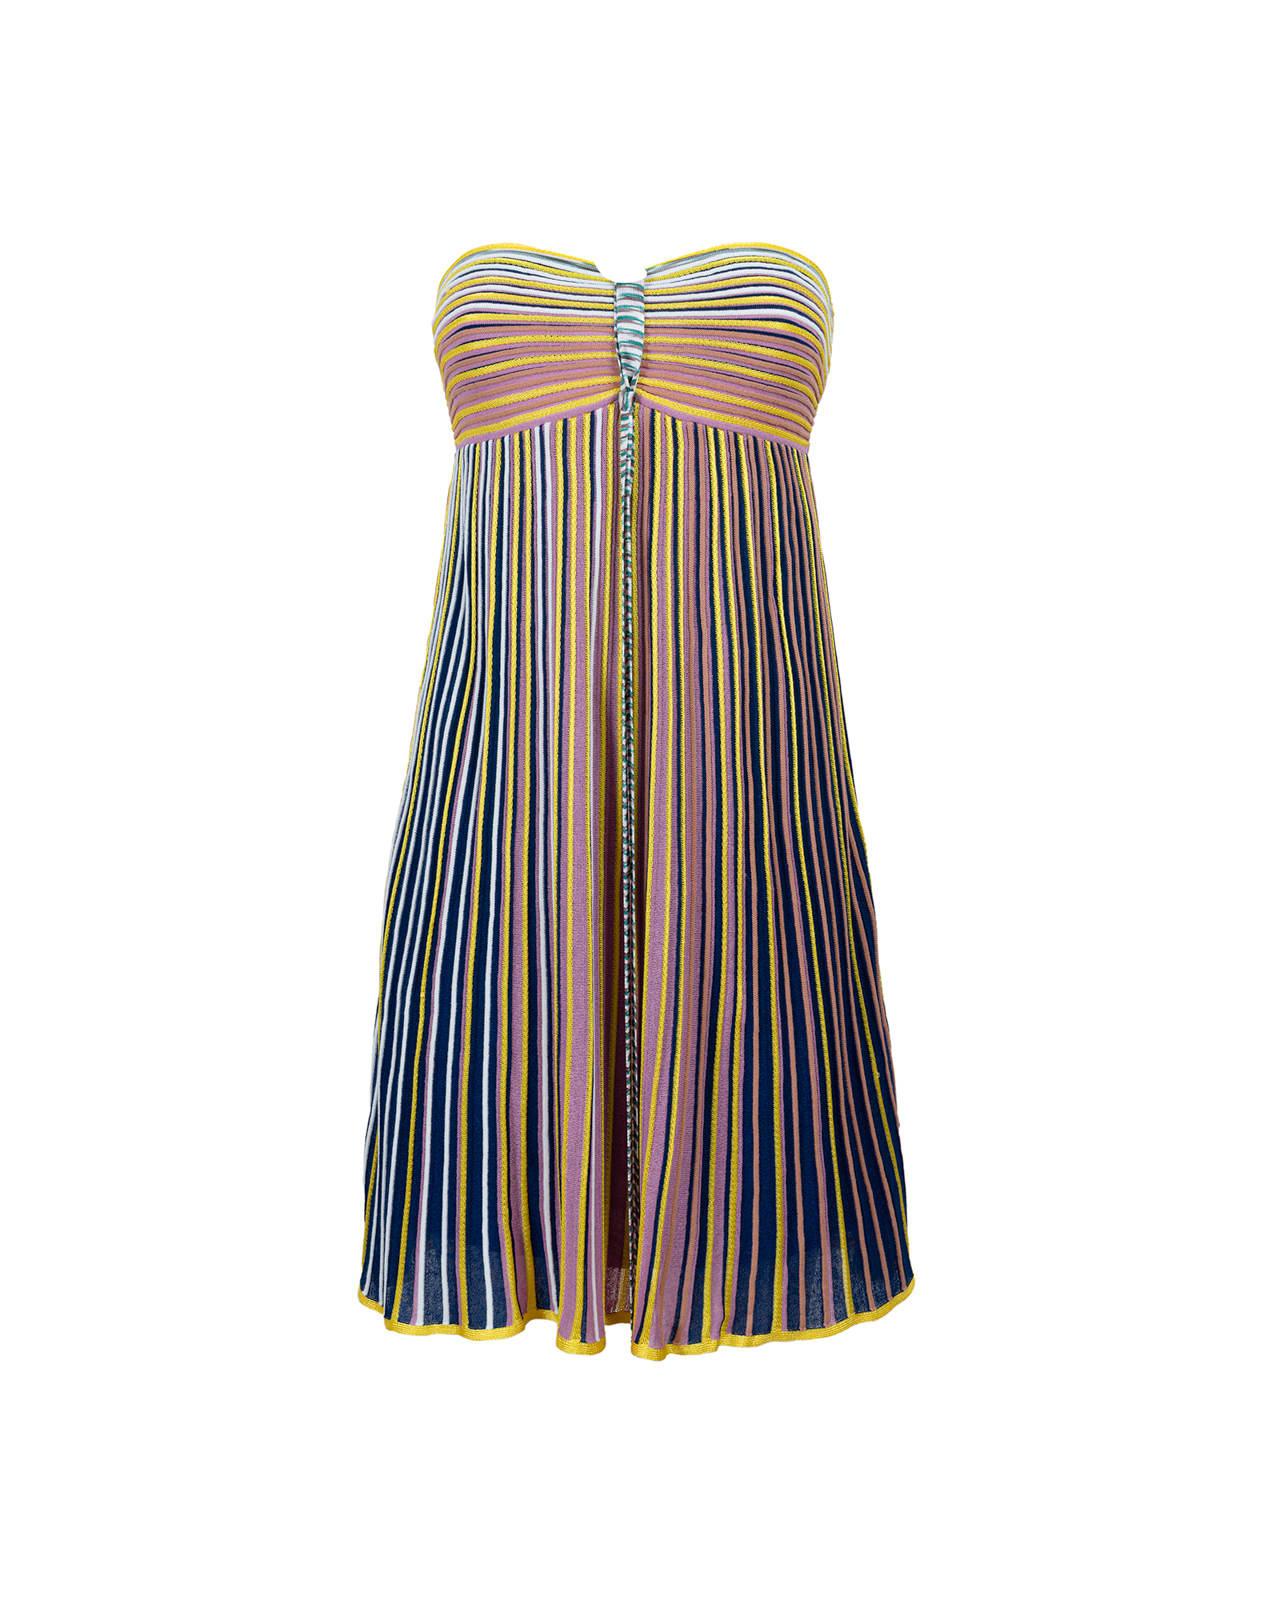 M Missoni cotton dress,